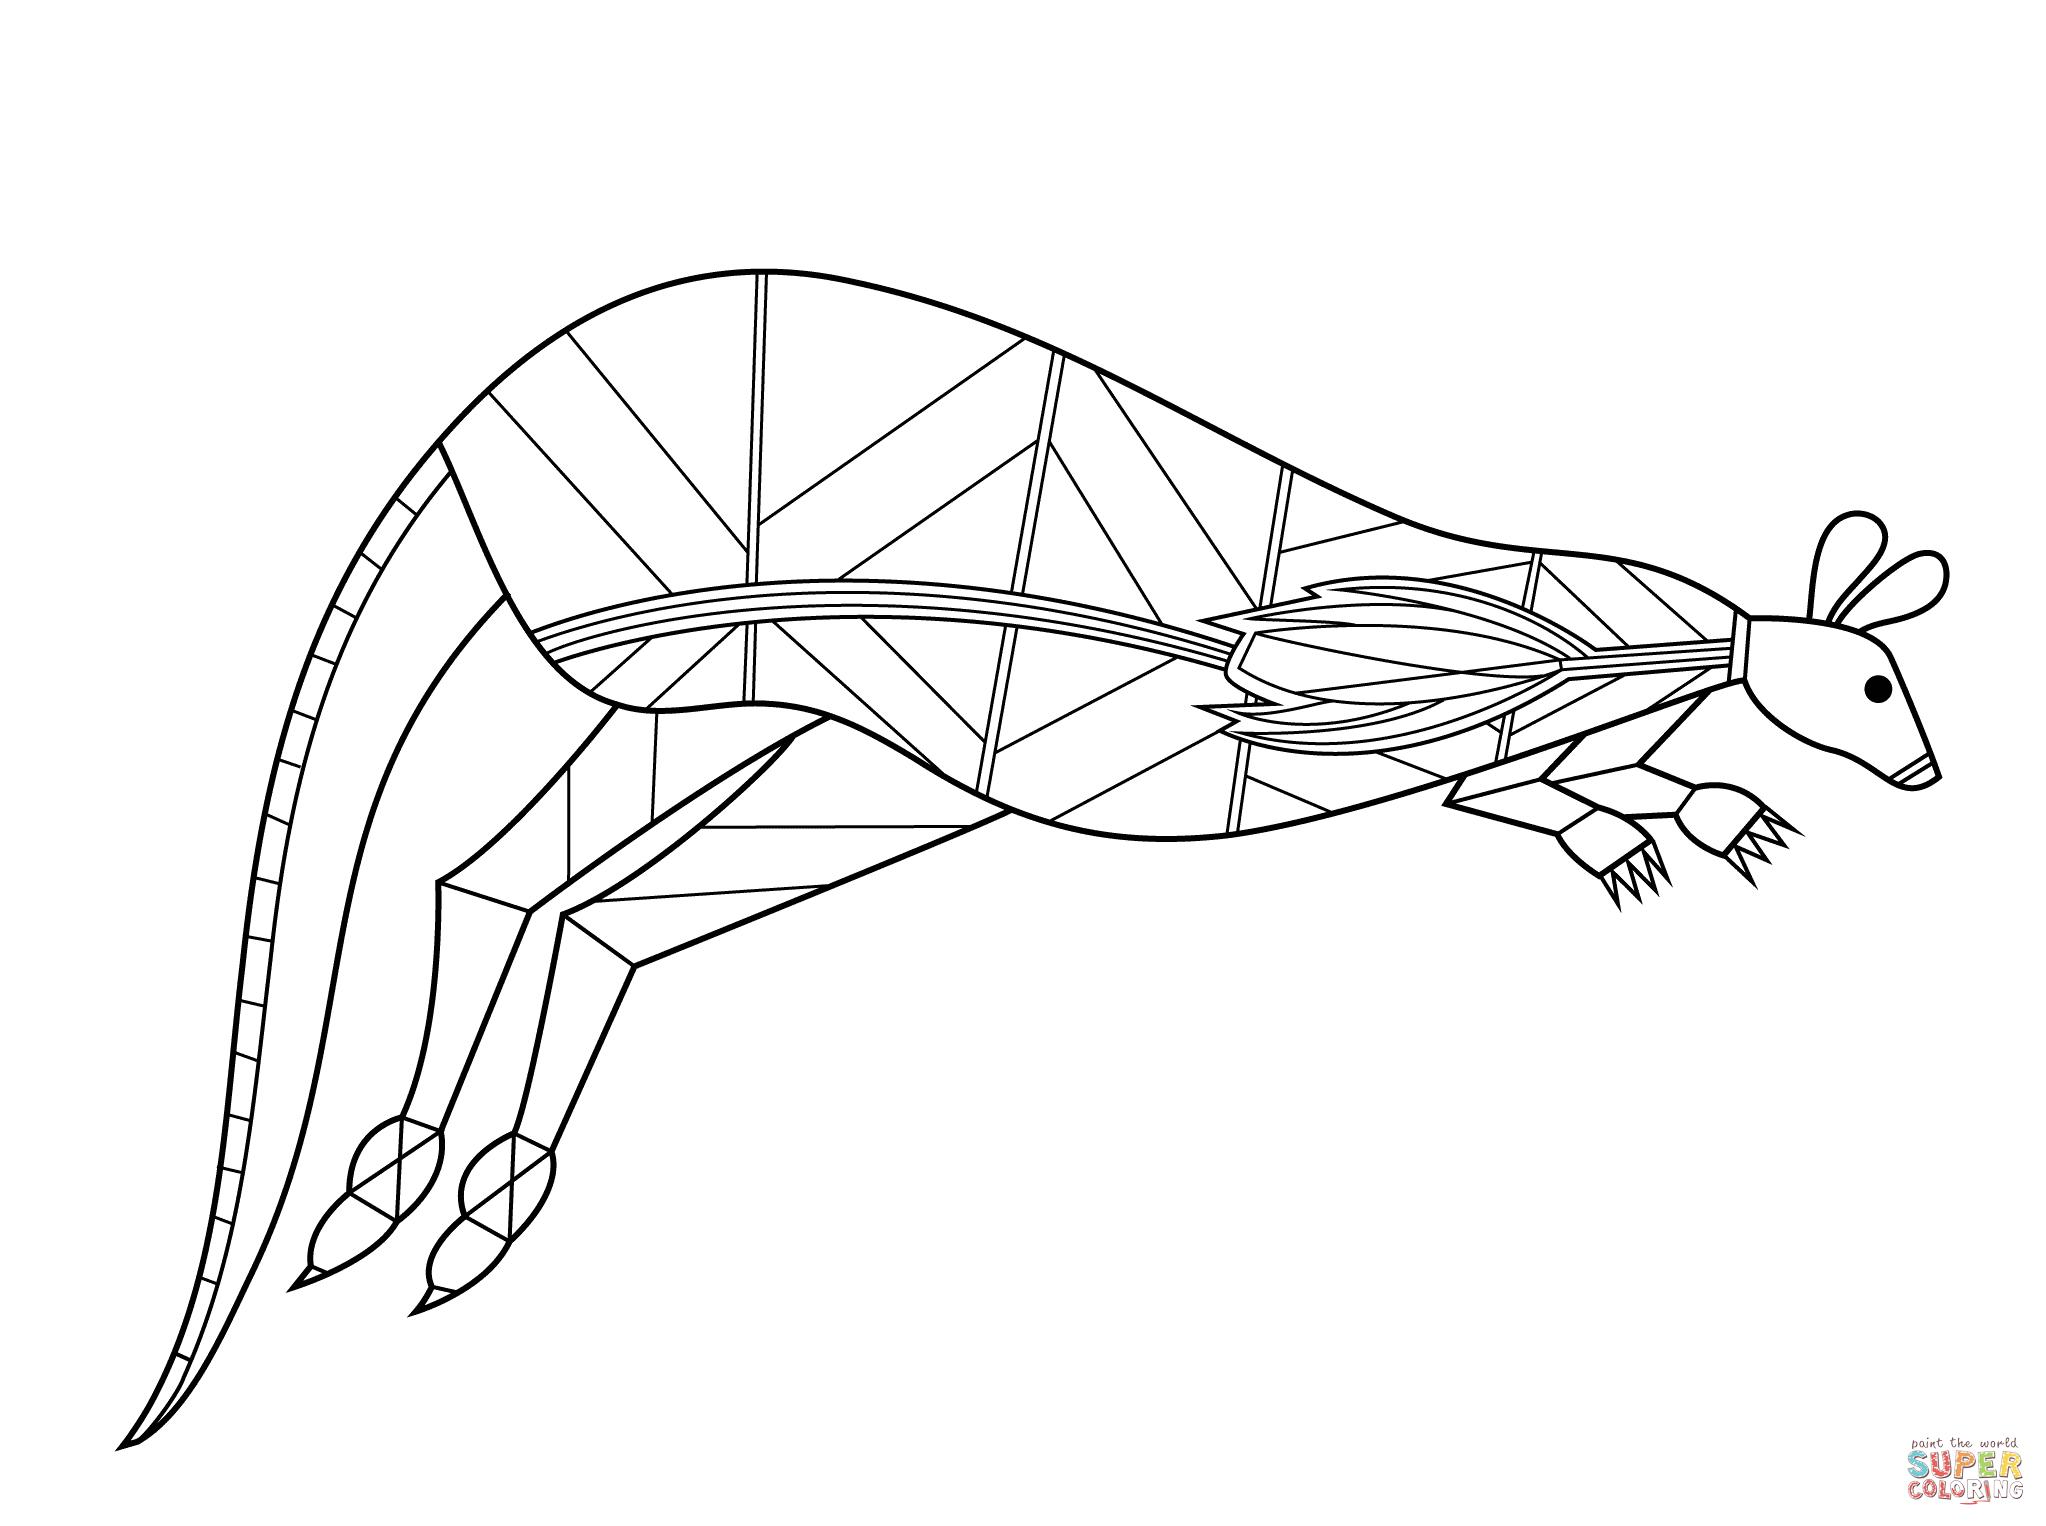 Kangaroo In Aboriginal Style Coloring Page | Free Printable Coloring - Free Printable Arty Animal Outlines